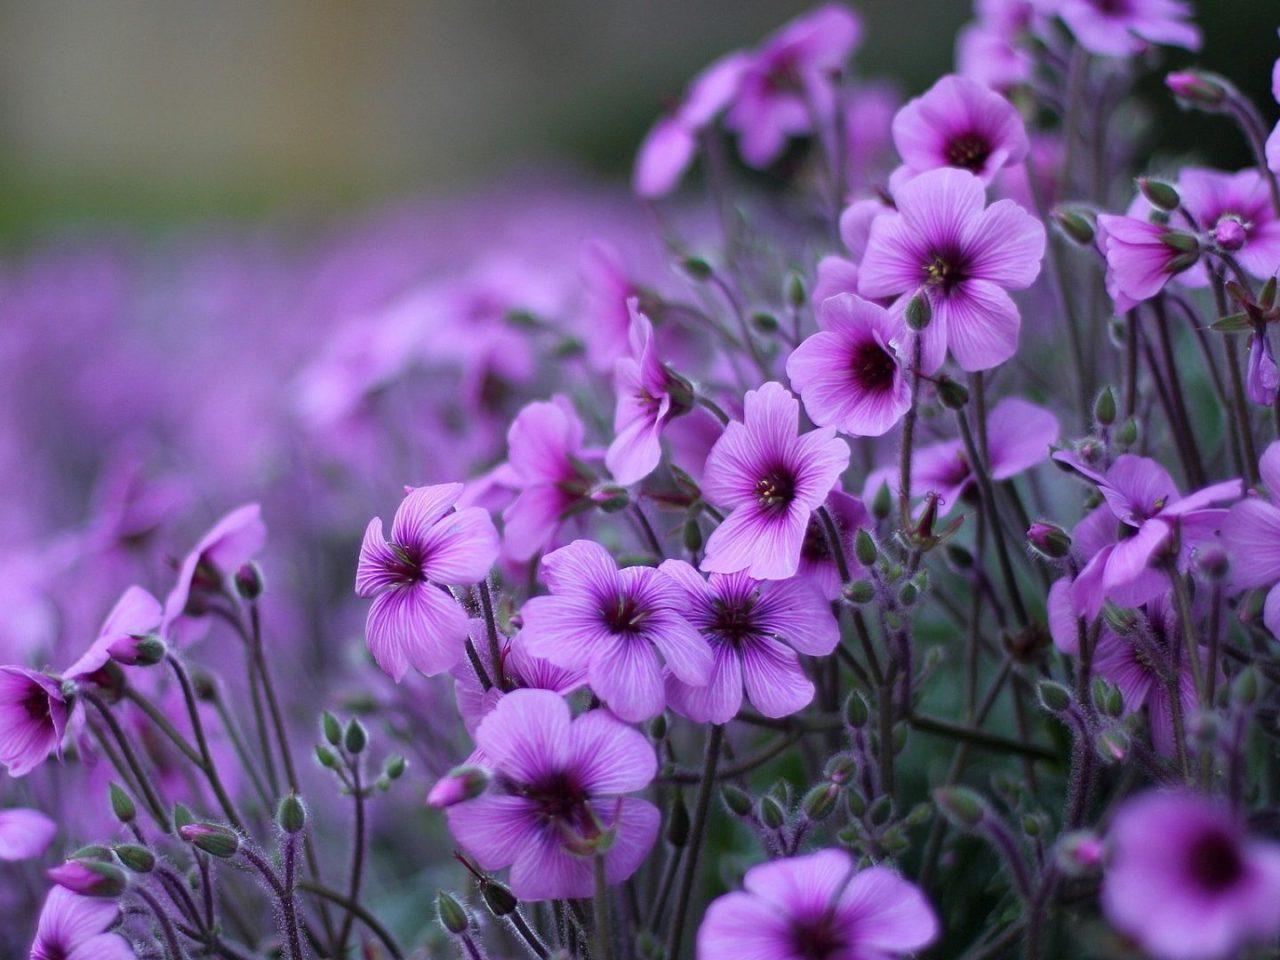 3d Animated Christmas Wallpapers Purple Flowers Geranium Ornamental Flowering Plants Hd